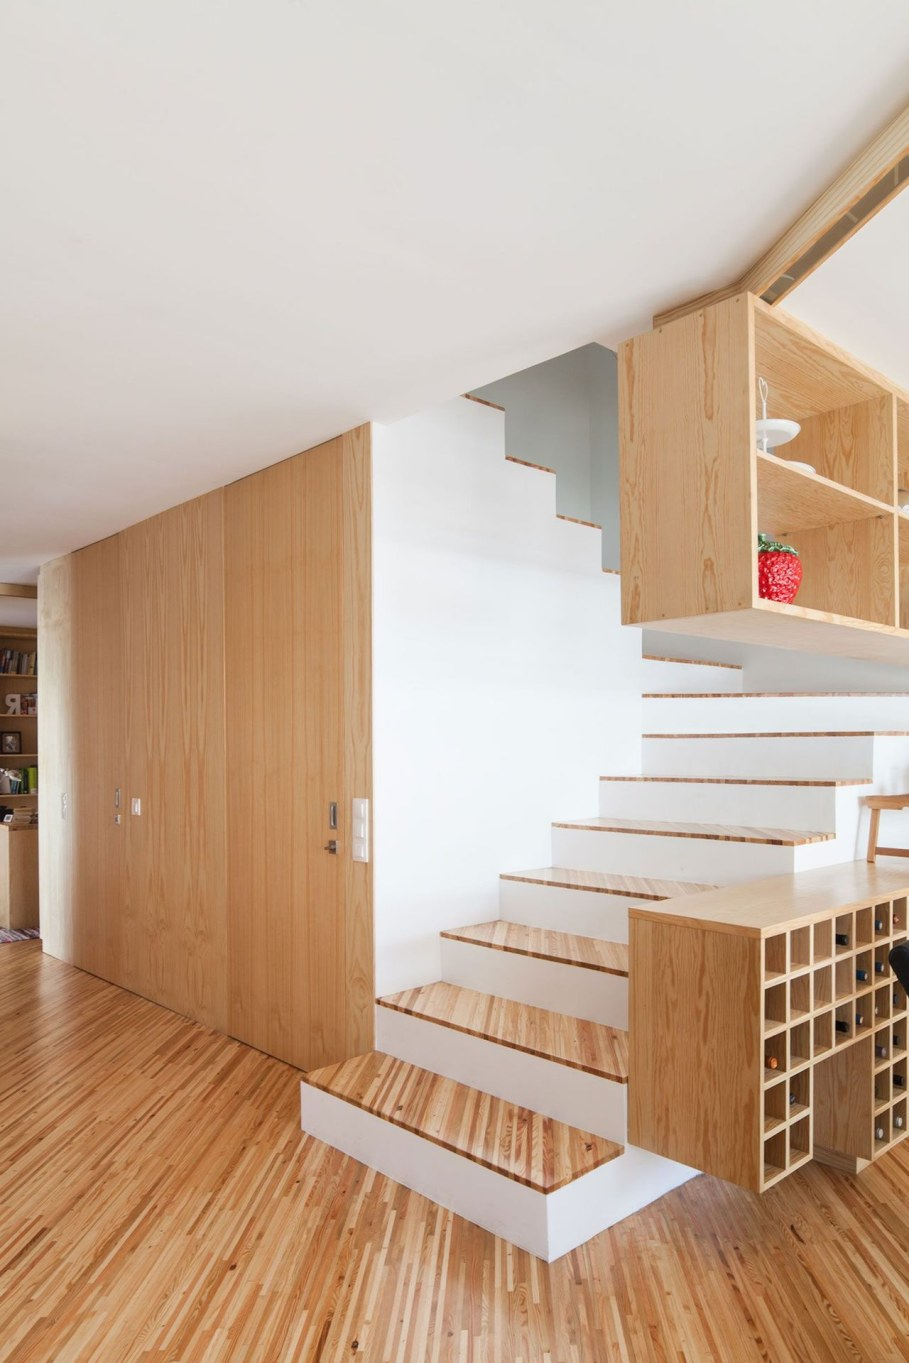 Silver Wood House By Ernesto Pereira - Staircase